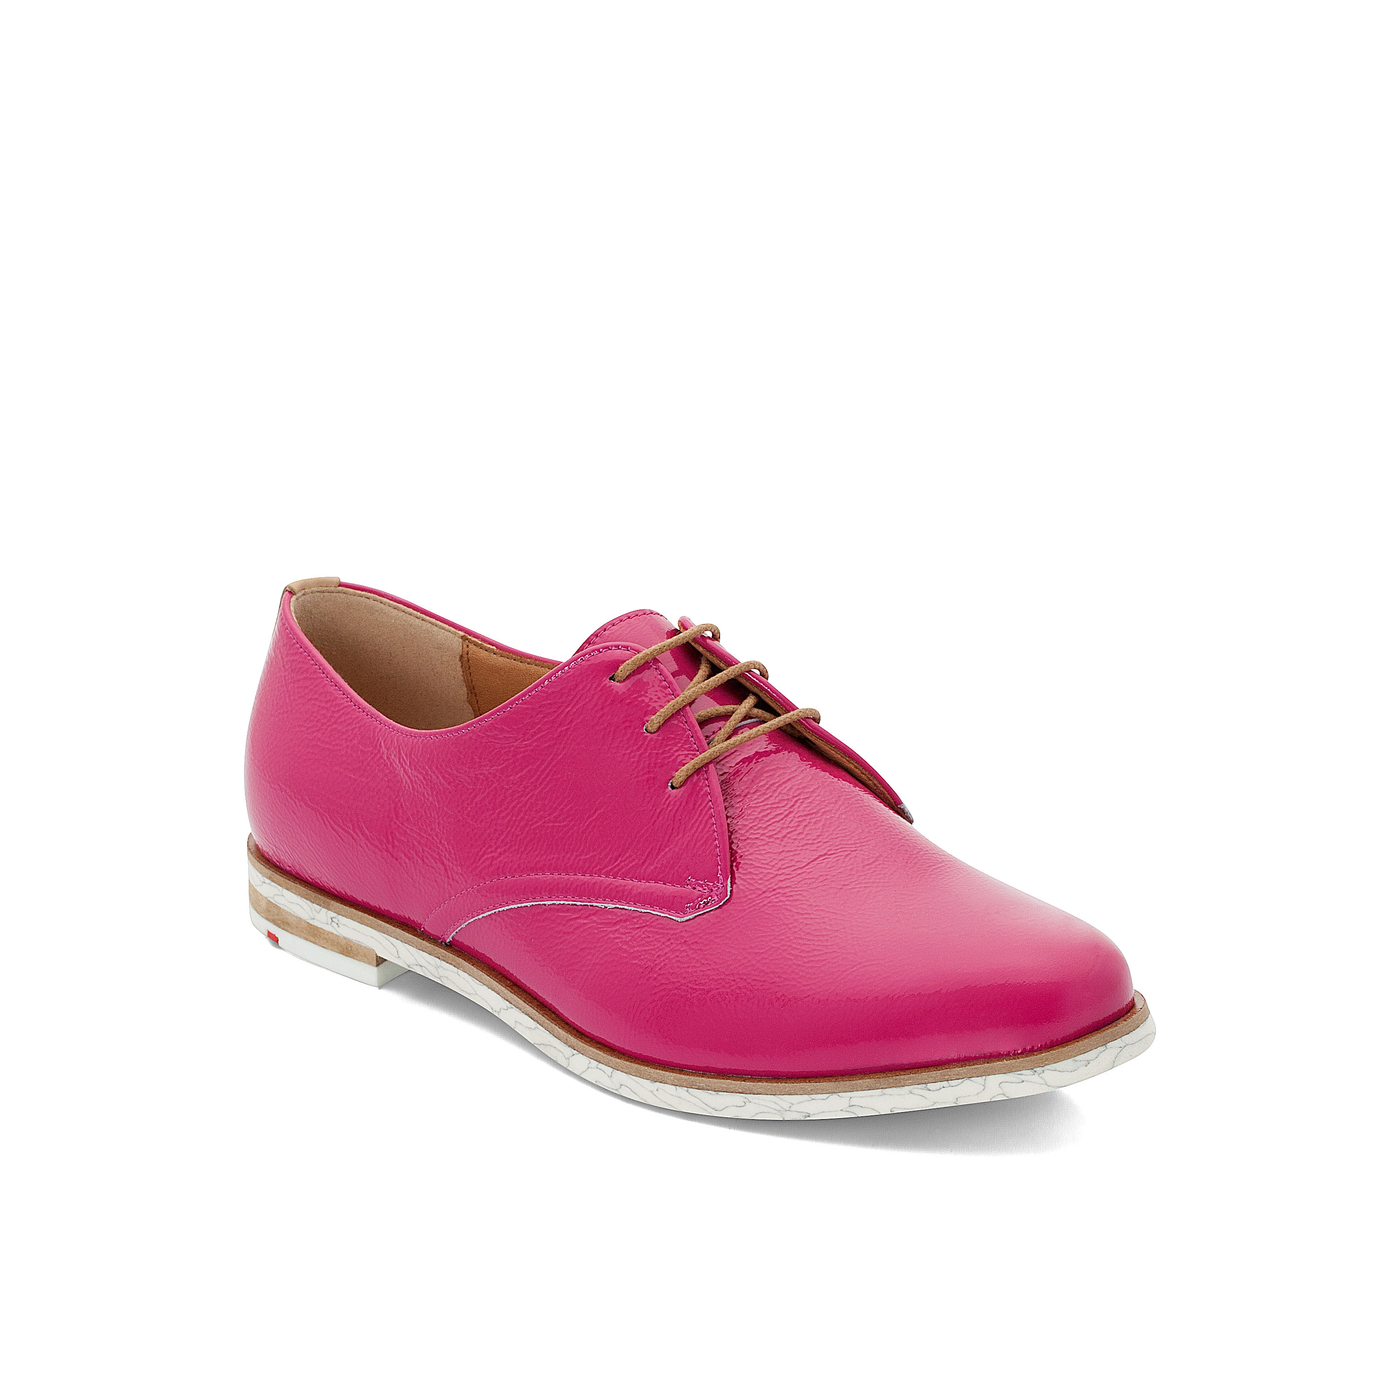 Halbschuhe | Schuhe > Boots > Schnürboots | Pink | Glattleder -  leder | LLOYD